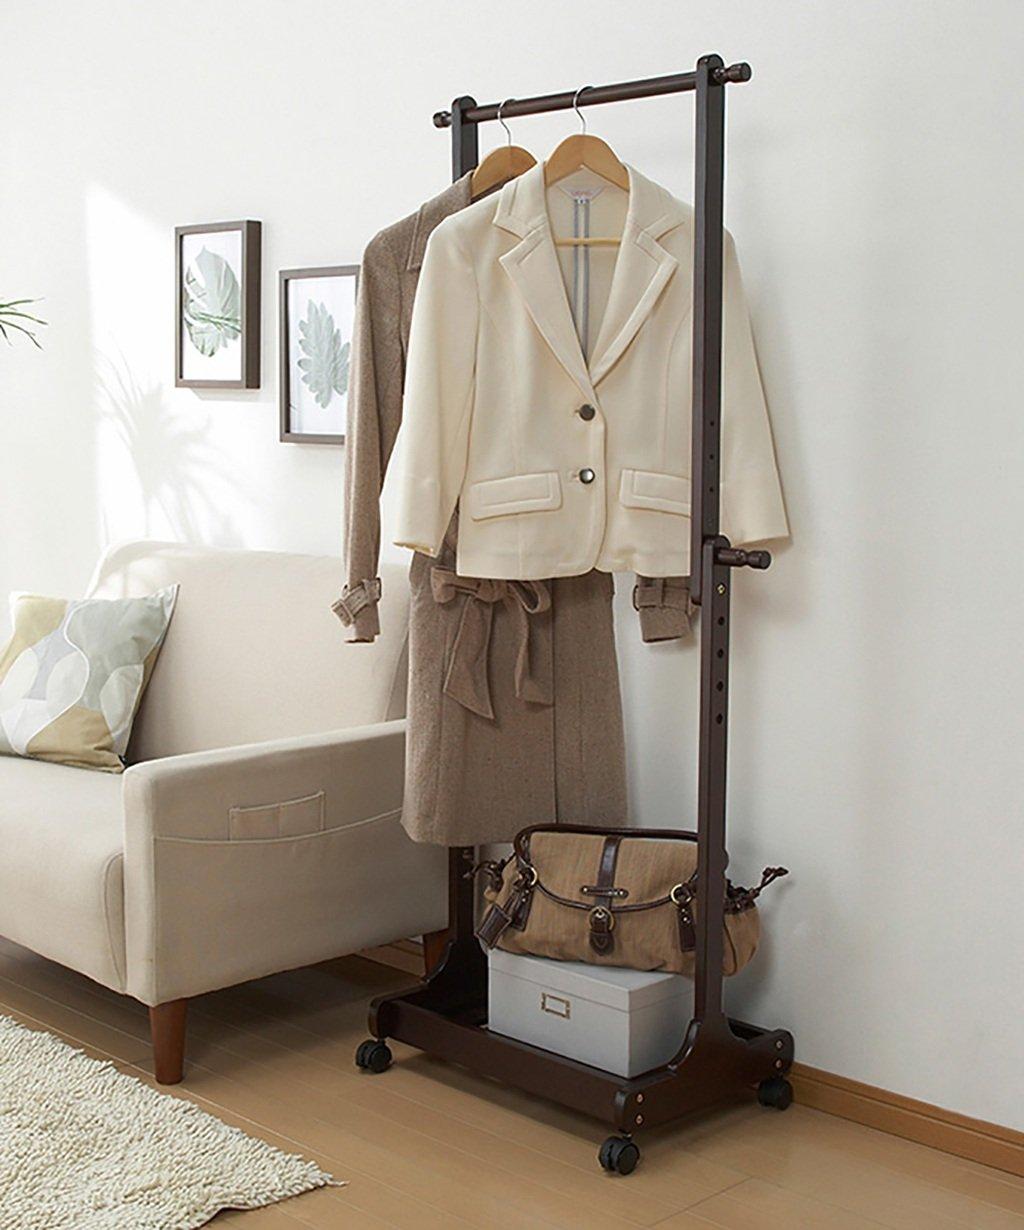 Altura Ajustable 132-150 Cm 4 Colores Opcional Muebles Interiores Simples JIANFEI Durable Perchero Burro Perchero Ropa Madera Maciza con 1 Capa Zapatero Color : Brown